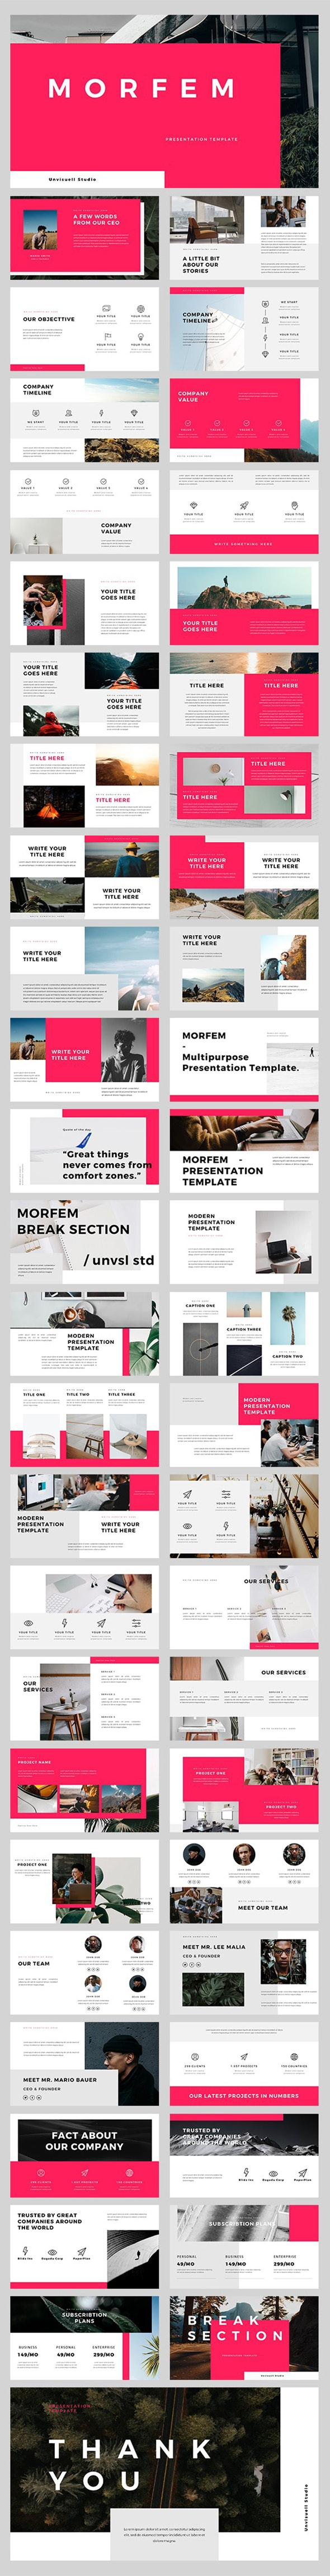 Morfem Keynote Template - Creative Keynote Templates